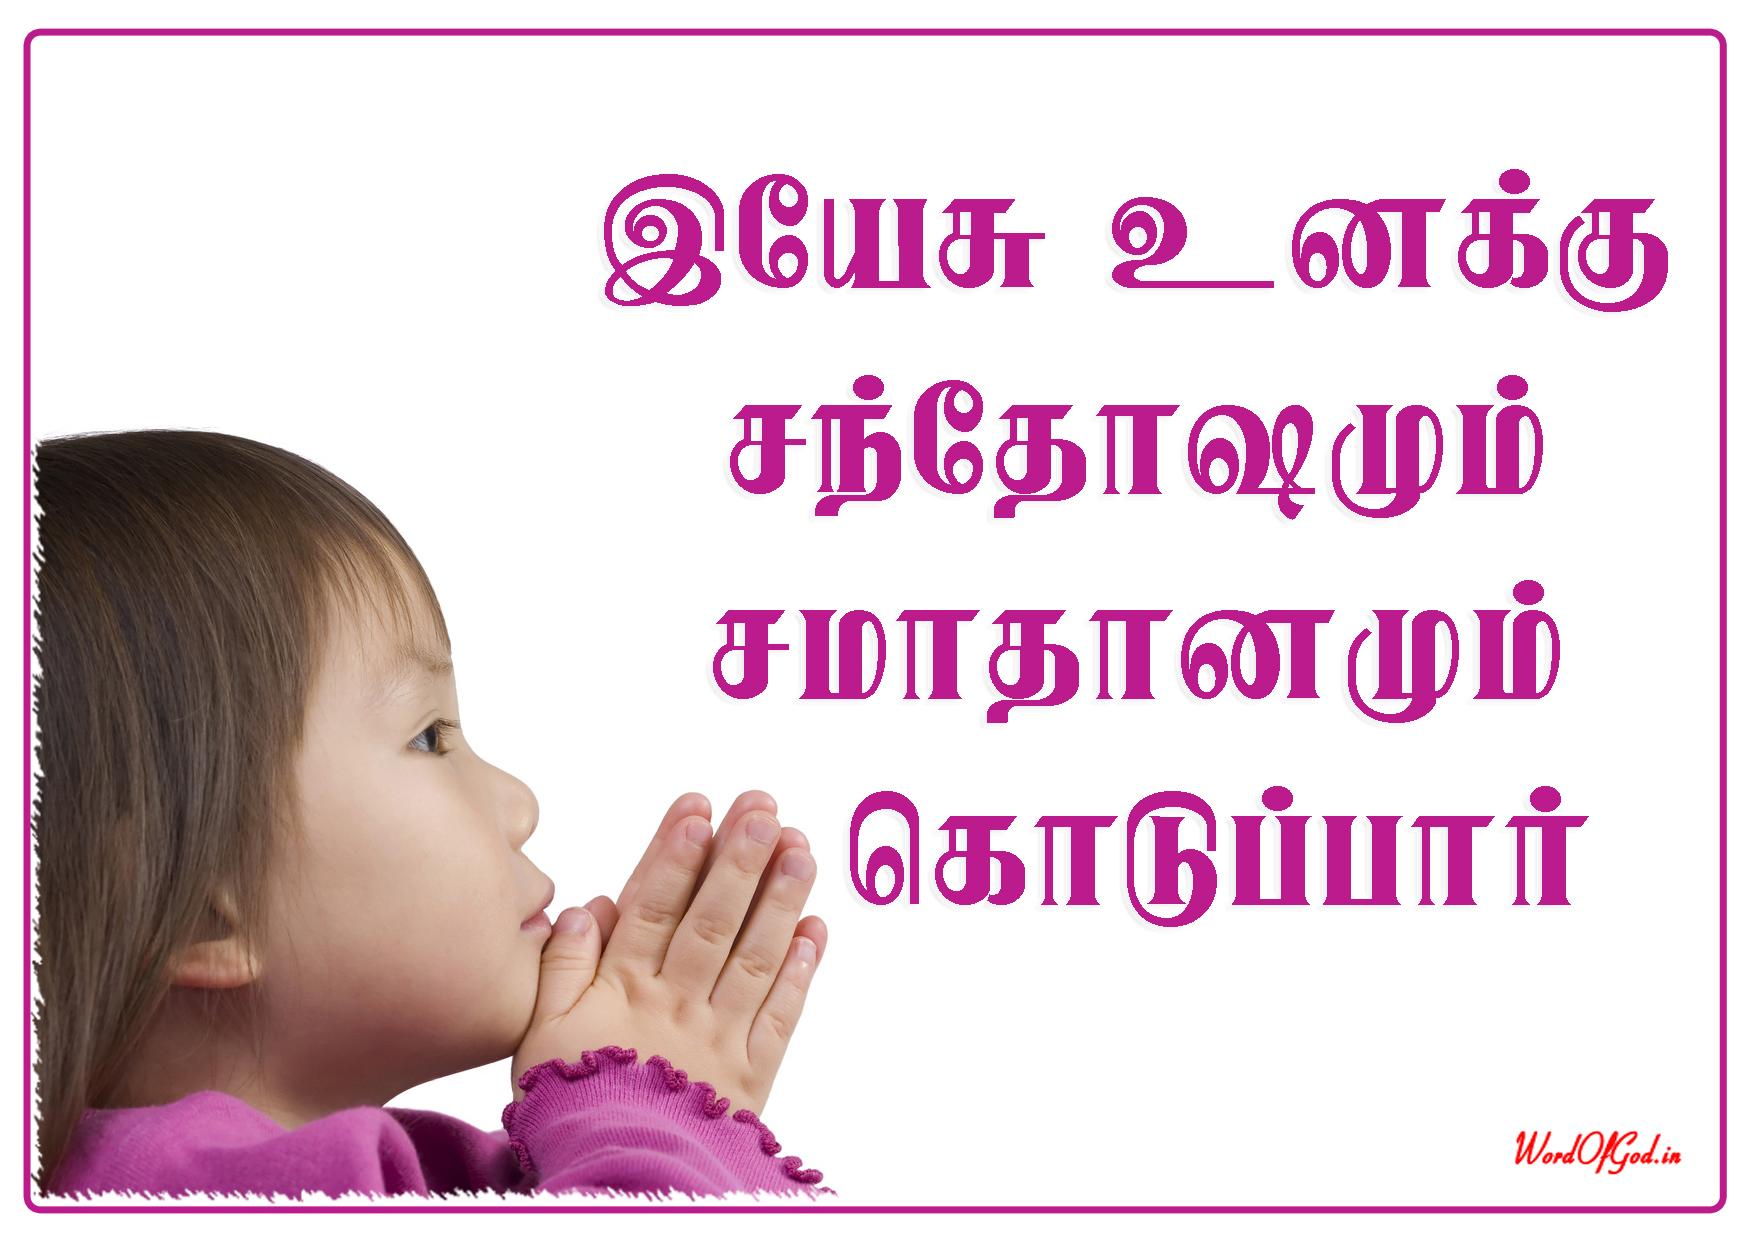 39 Tamil Christian Gospel Sticker Designs By Yesudas Solomon Free Christian Resources